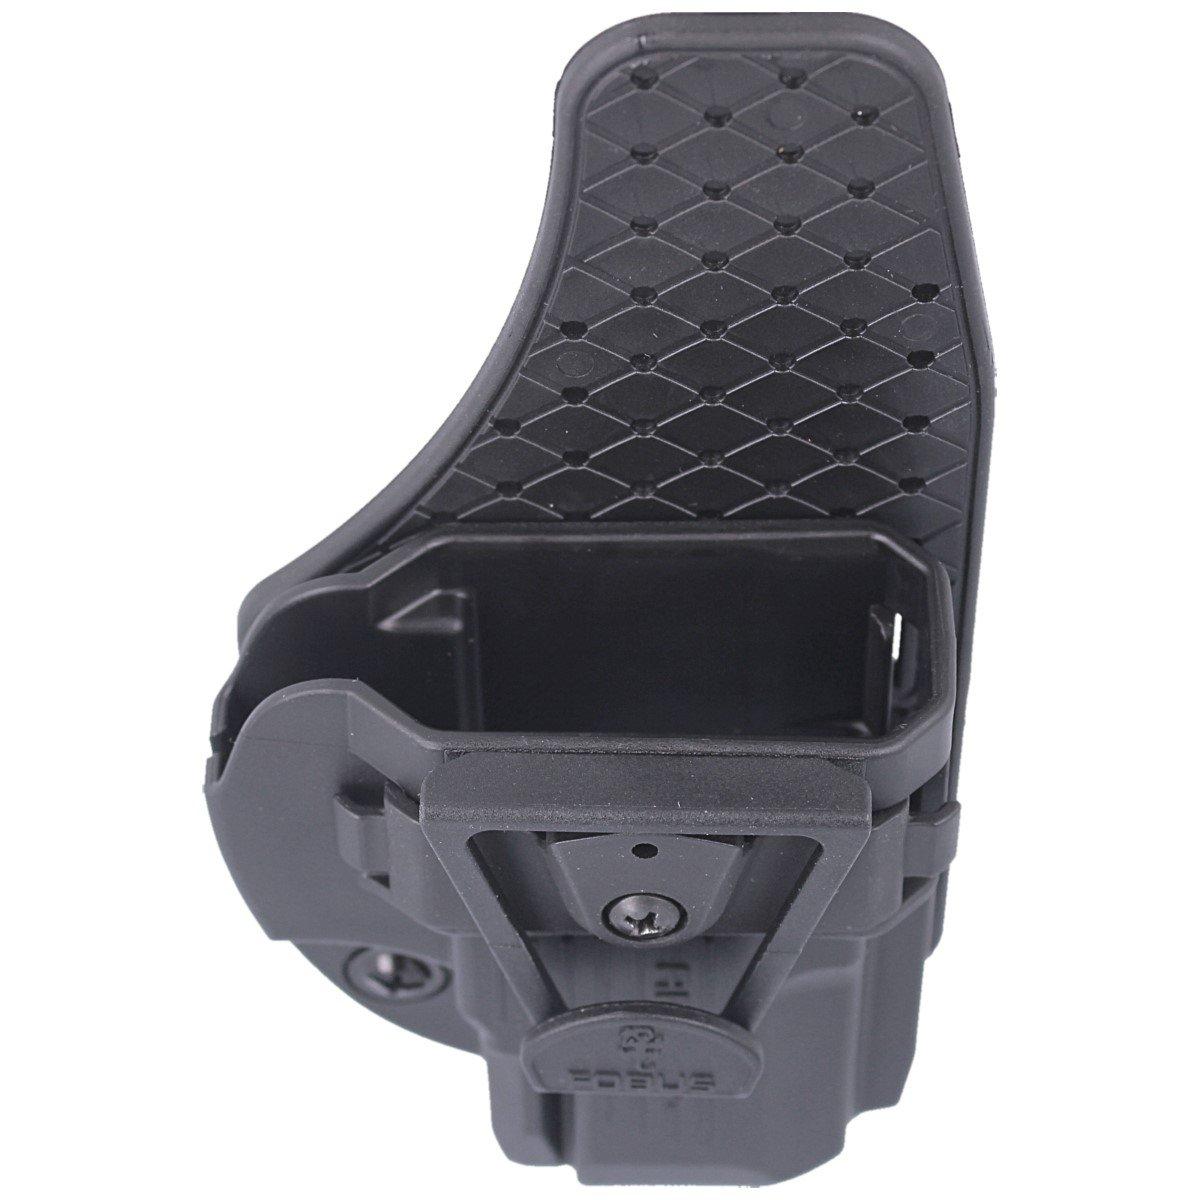 Asta Unisex-Adulto Blu Taglia Unica Gunn /& Moore Gripper 4 Mirage Ultra Short